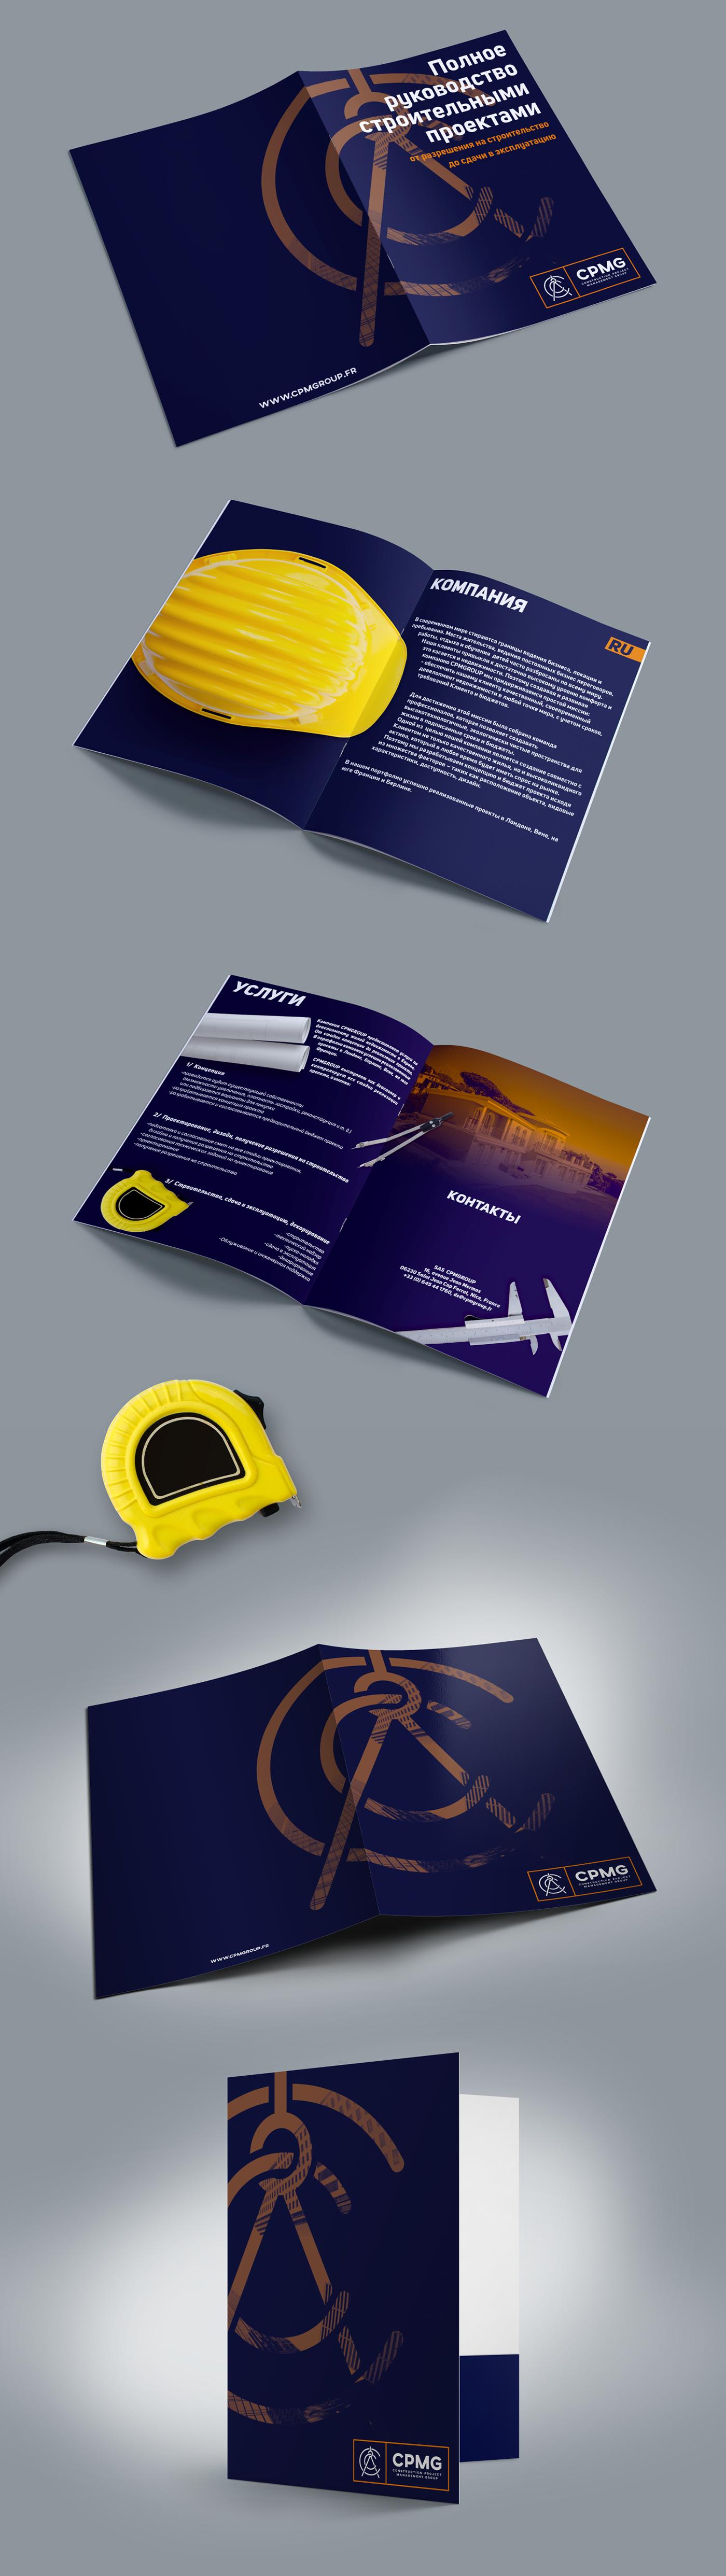 branding  identity corporate branding graphic design  construction architect architecture Logo Design